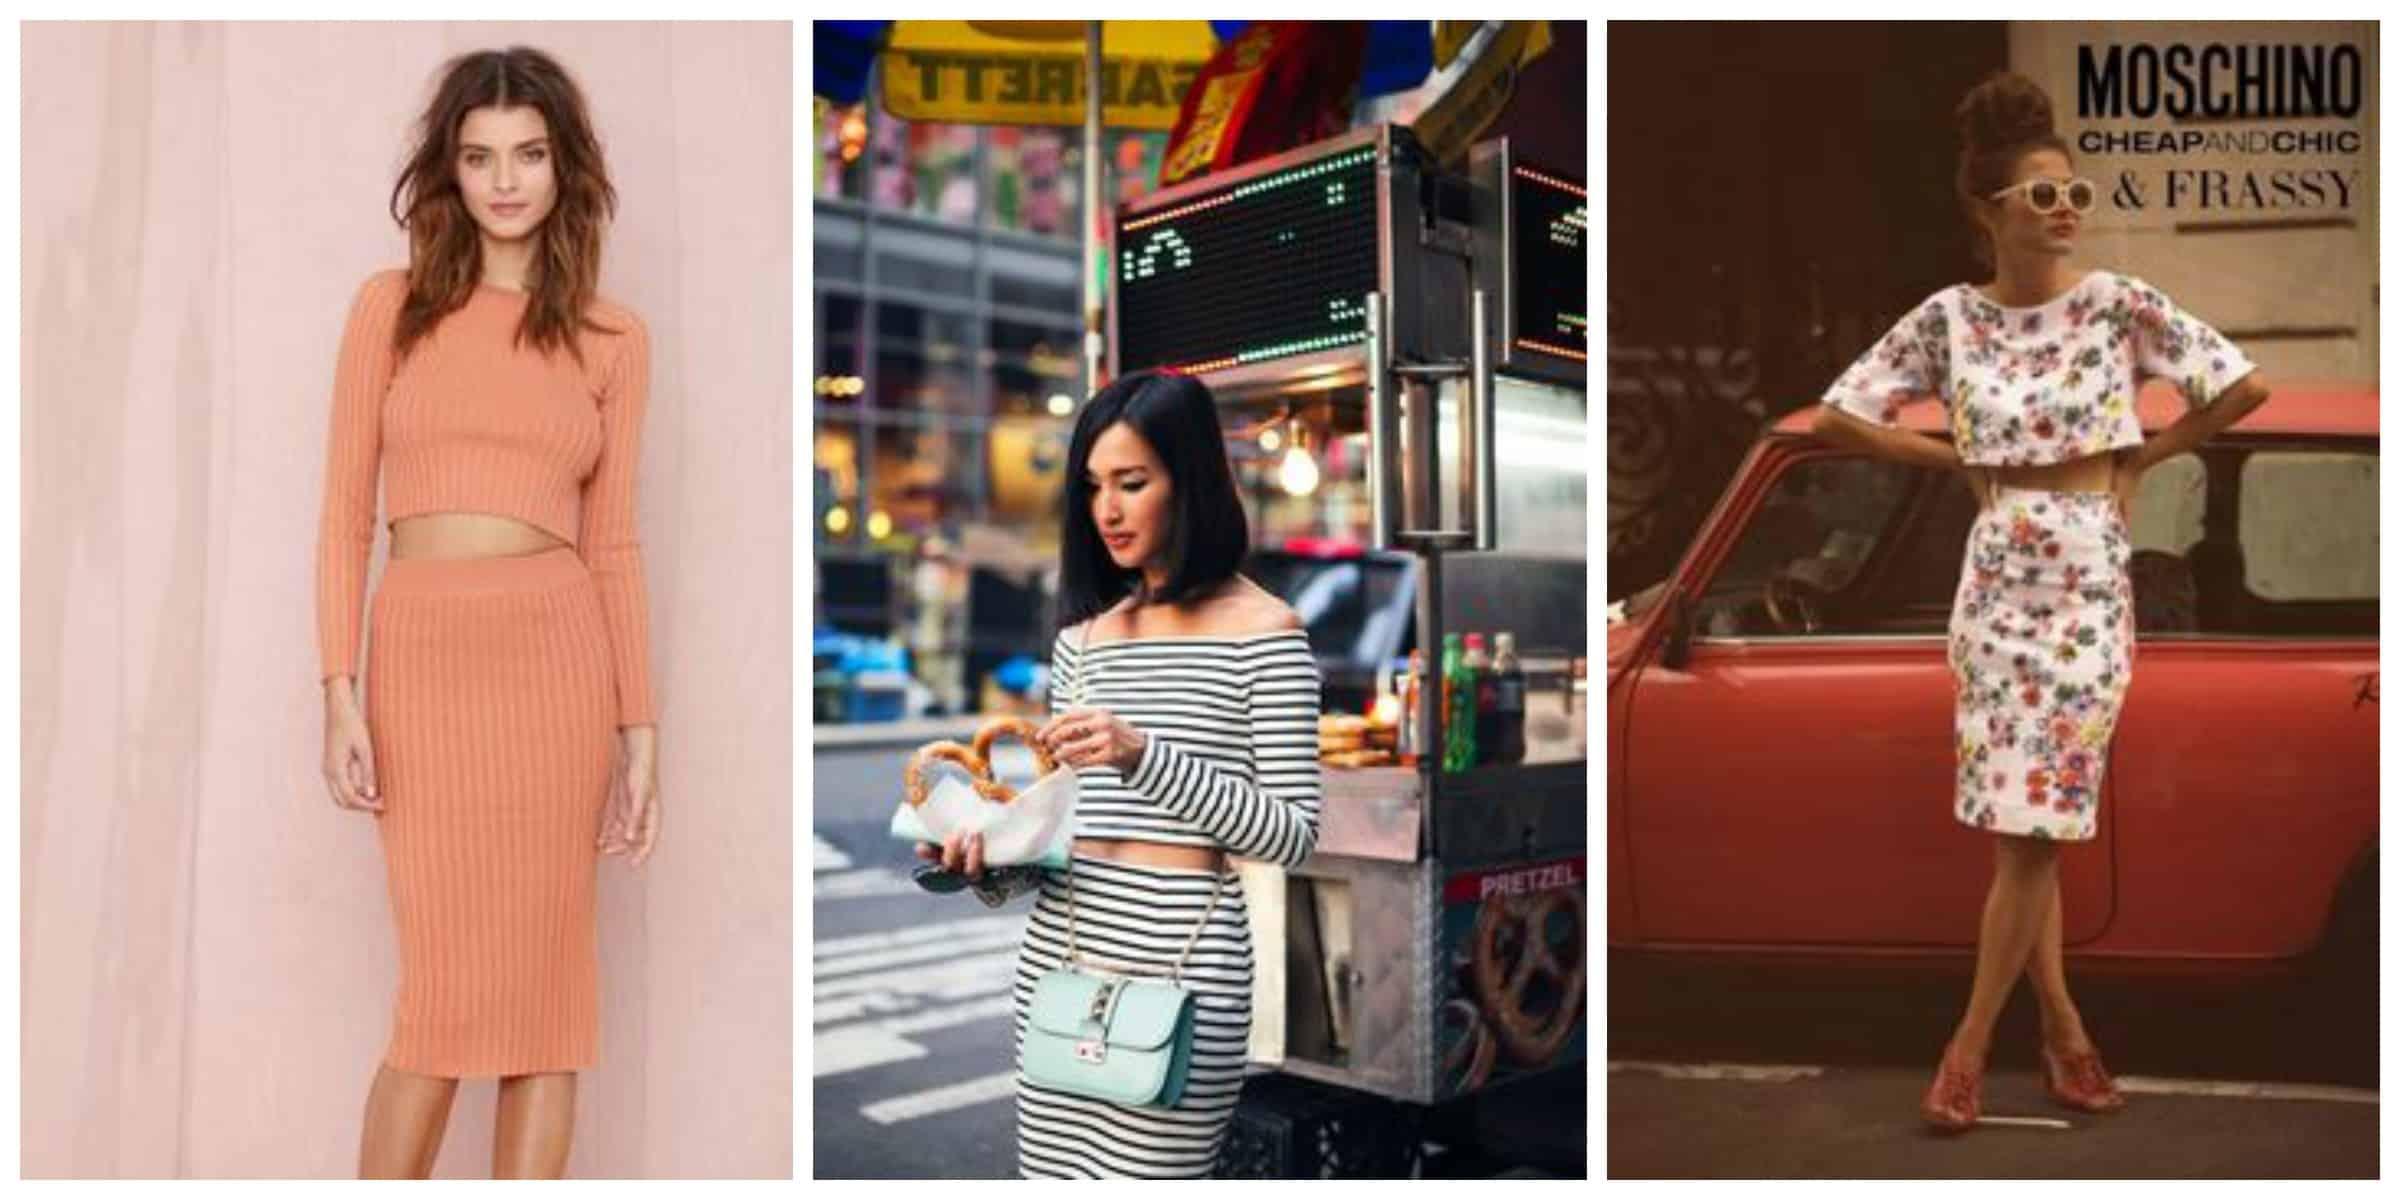 matchy-matchy-sets-street-style-trend-2015-7